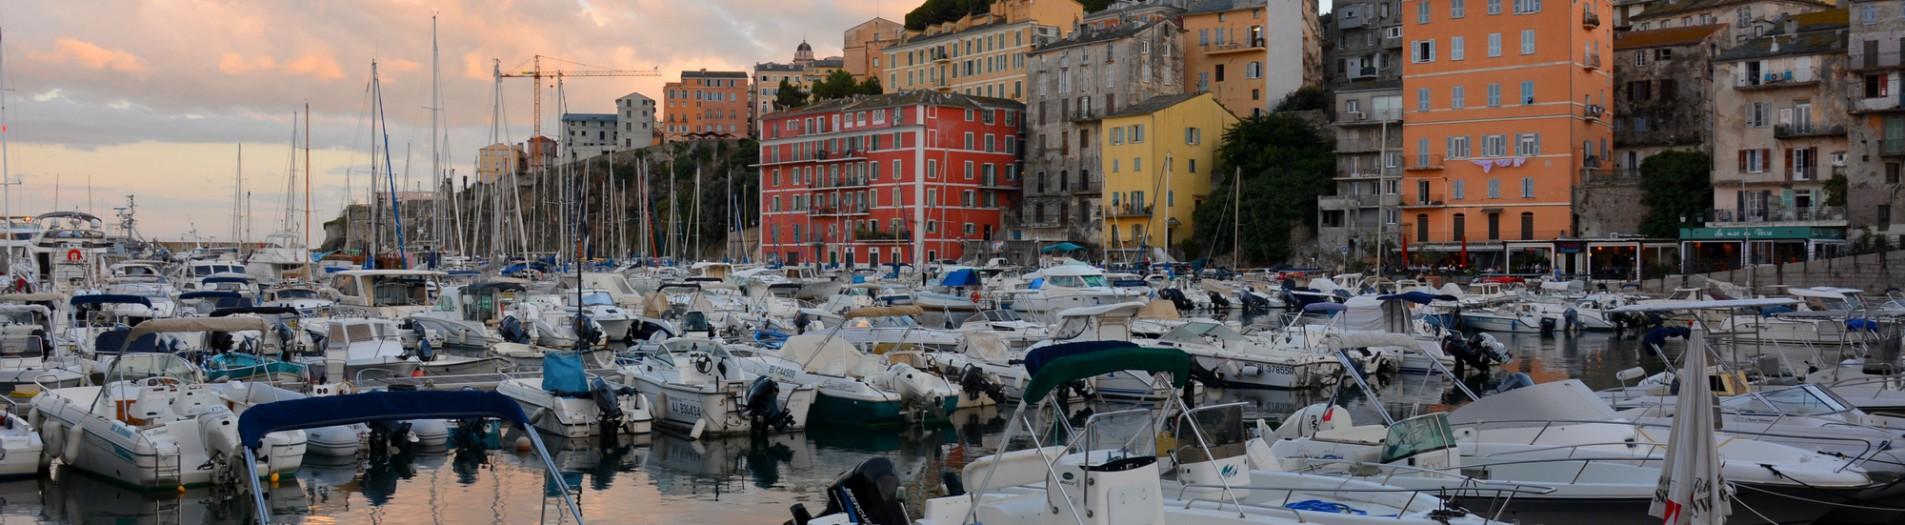 Bastia, sunset and night